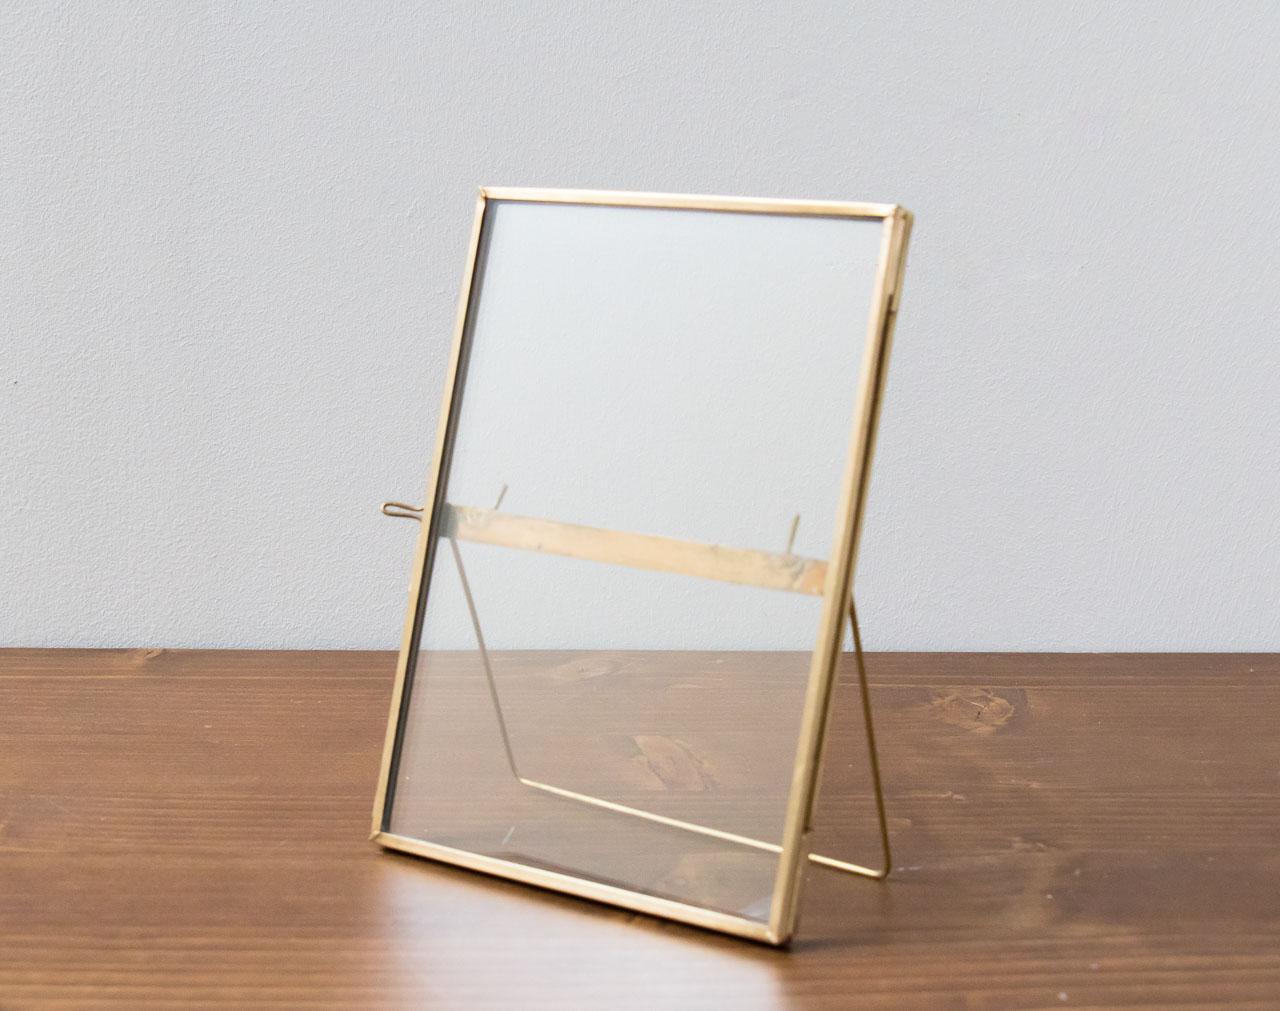 Cadre en verre dor poser hubsch math v lyon - Cadre photo en verre a poser ...